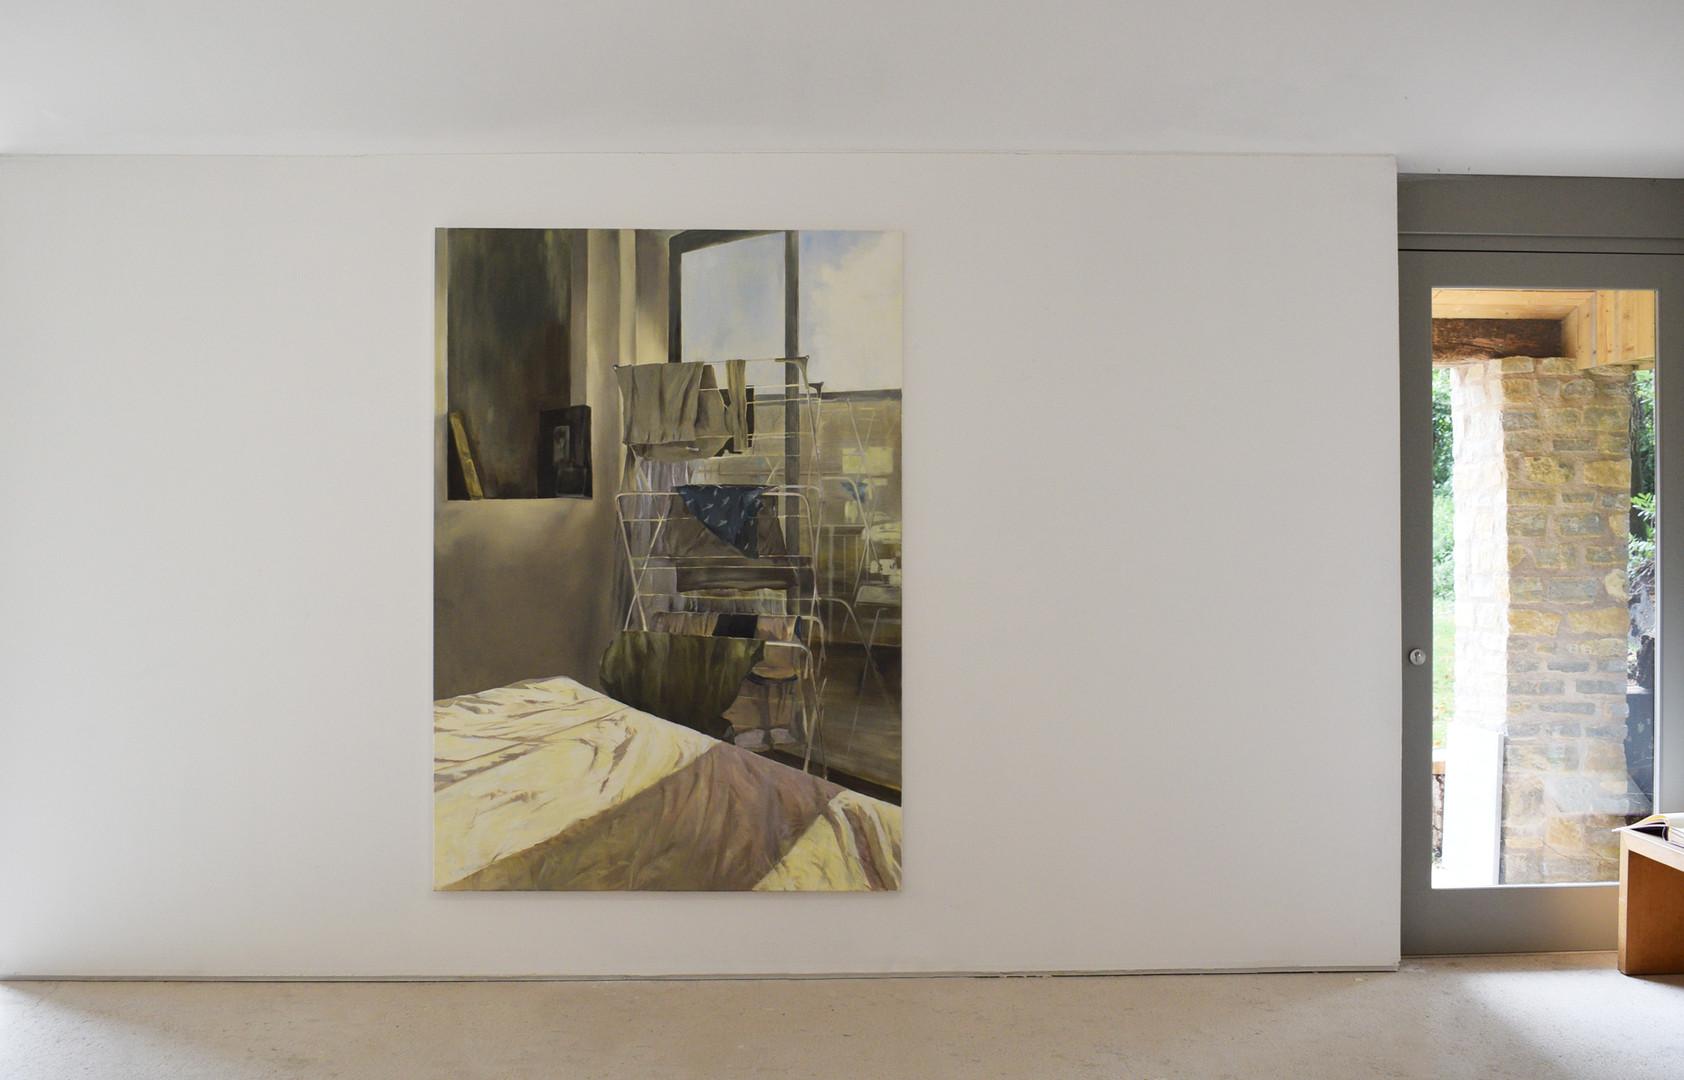 'Washing' by Katherine Perrins